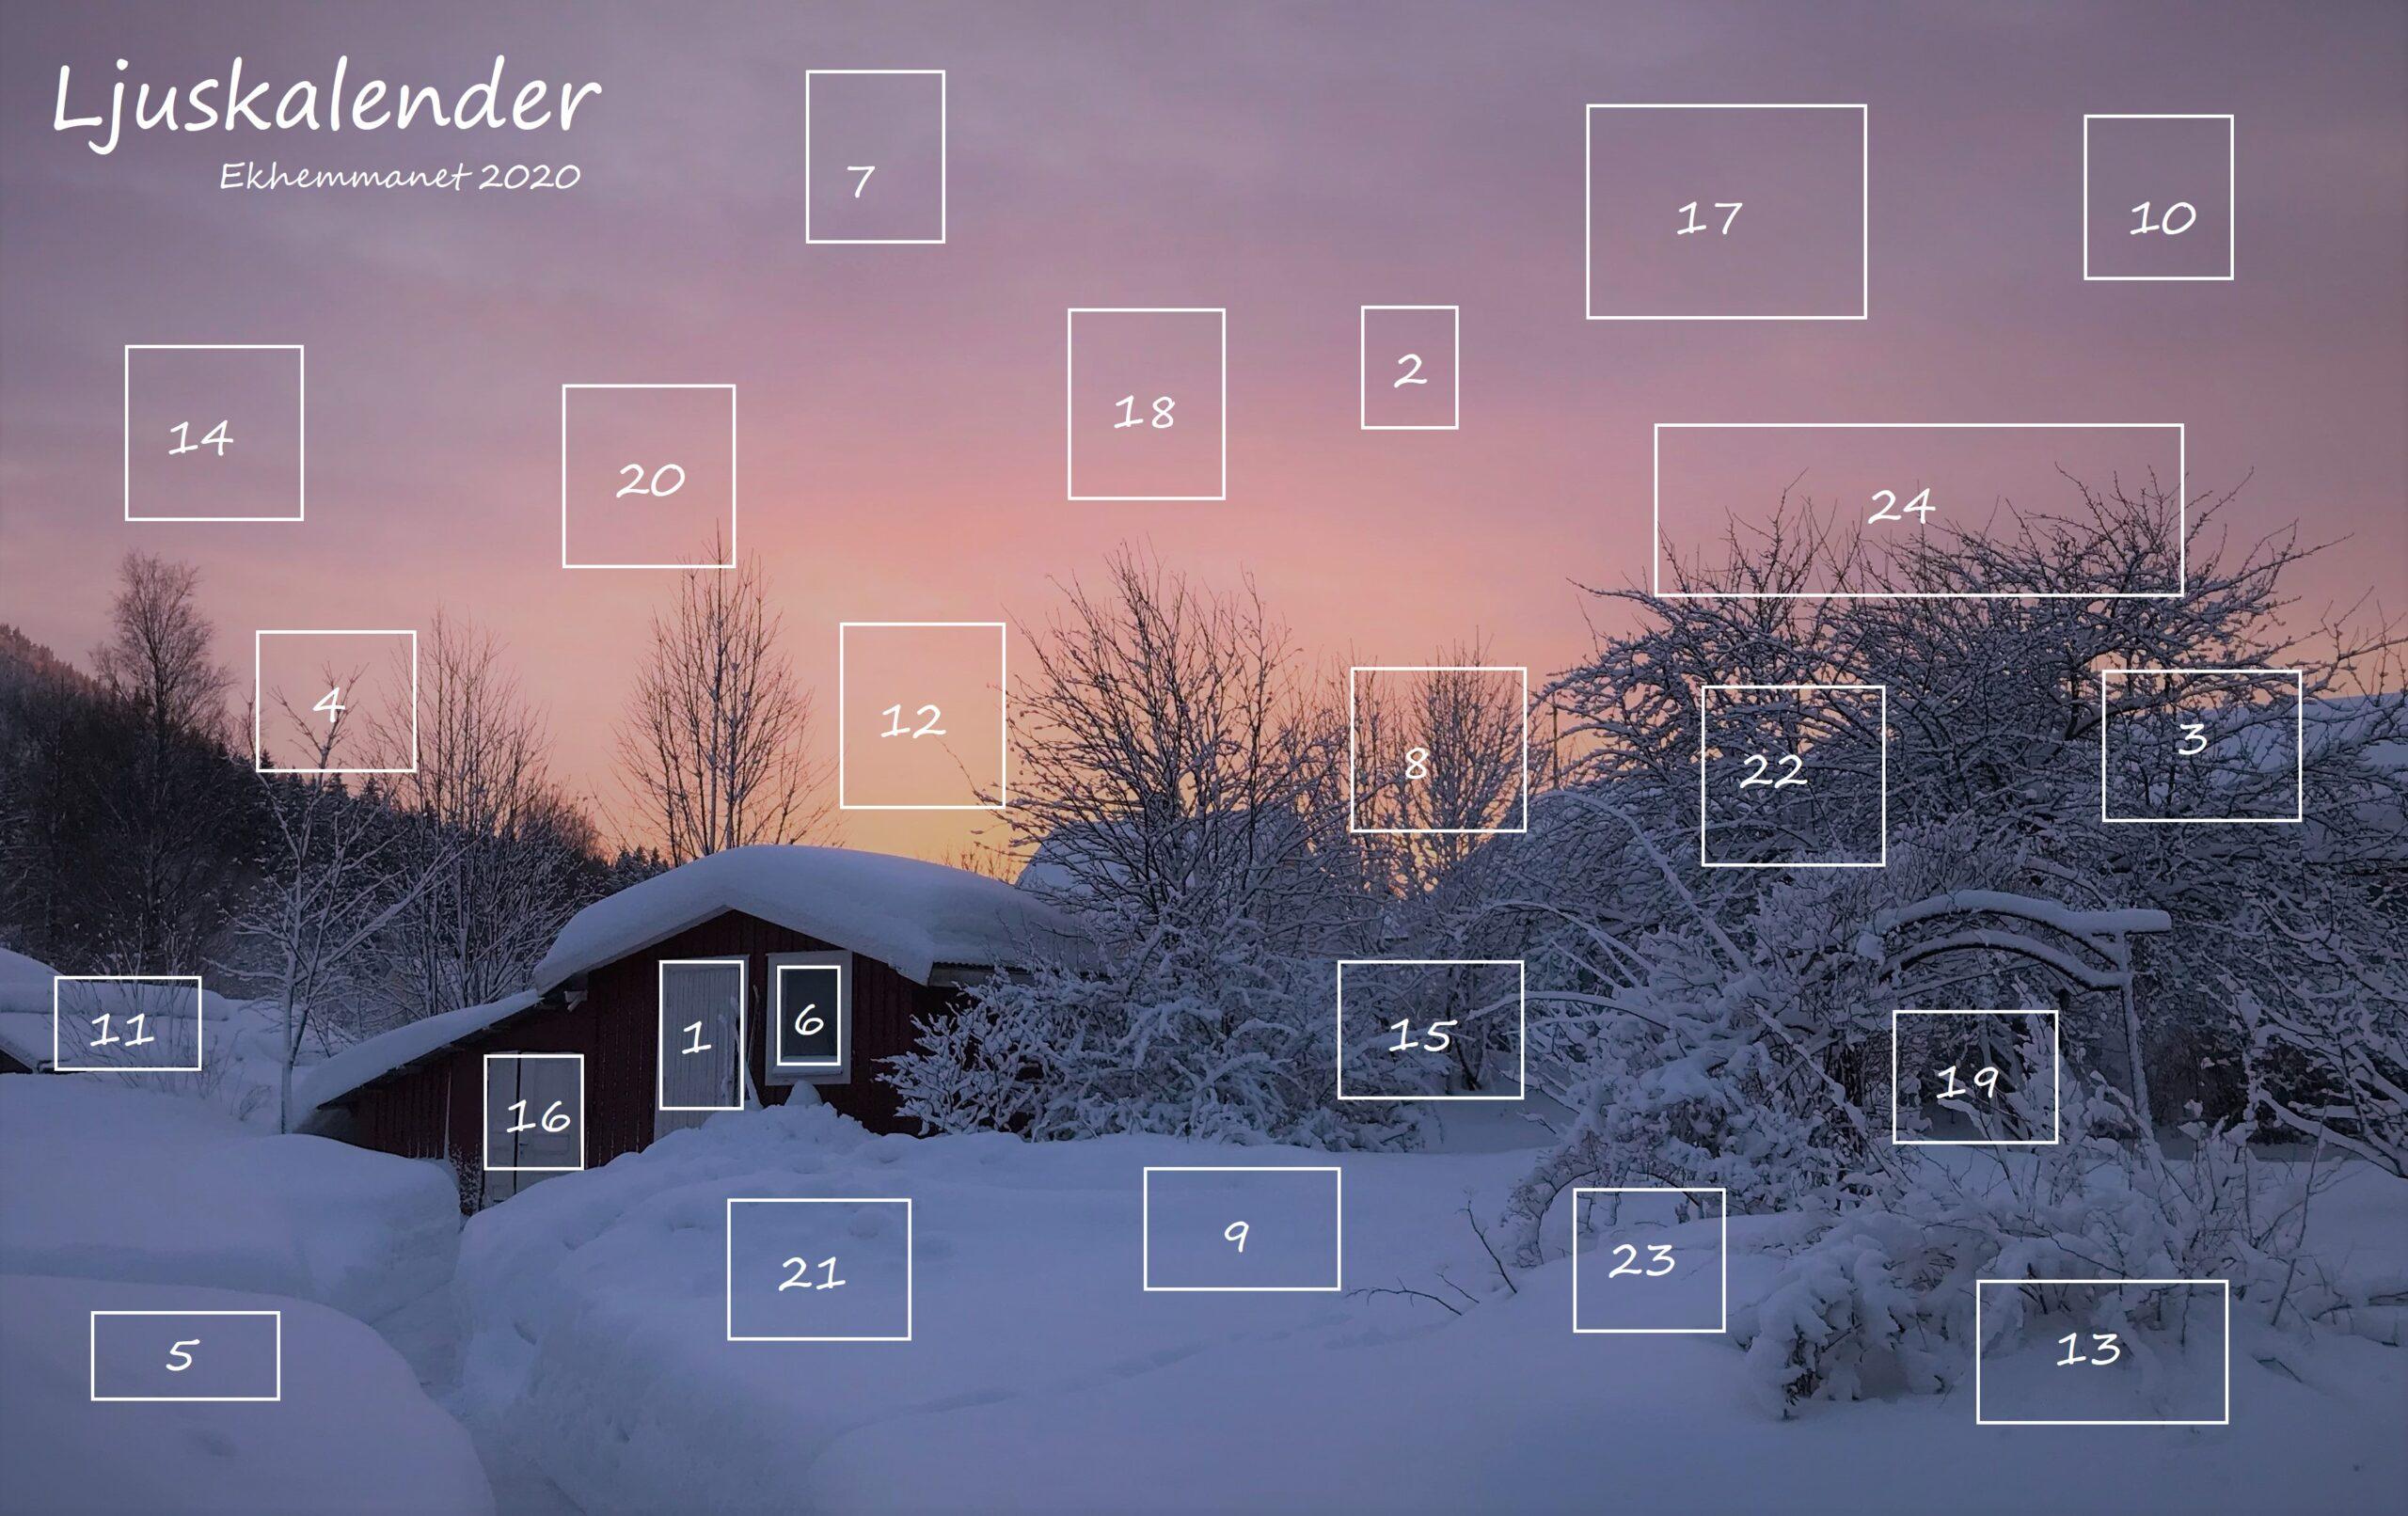 Privat: Ljuskalender